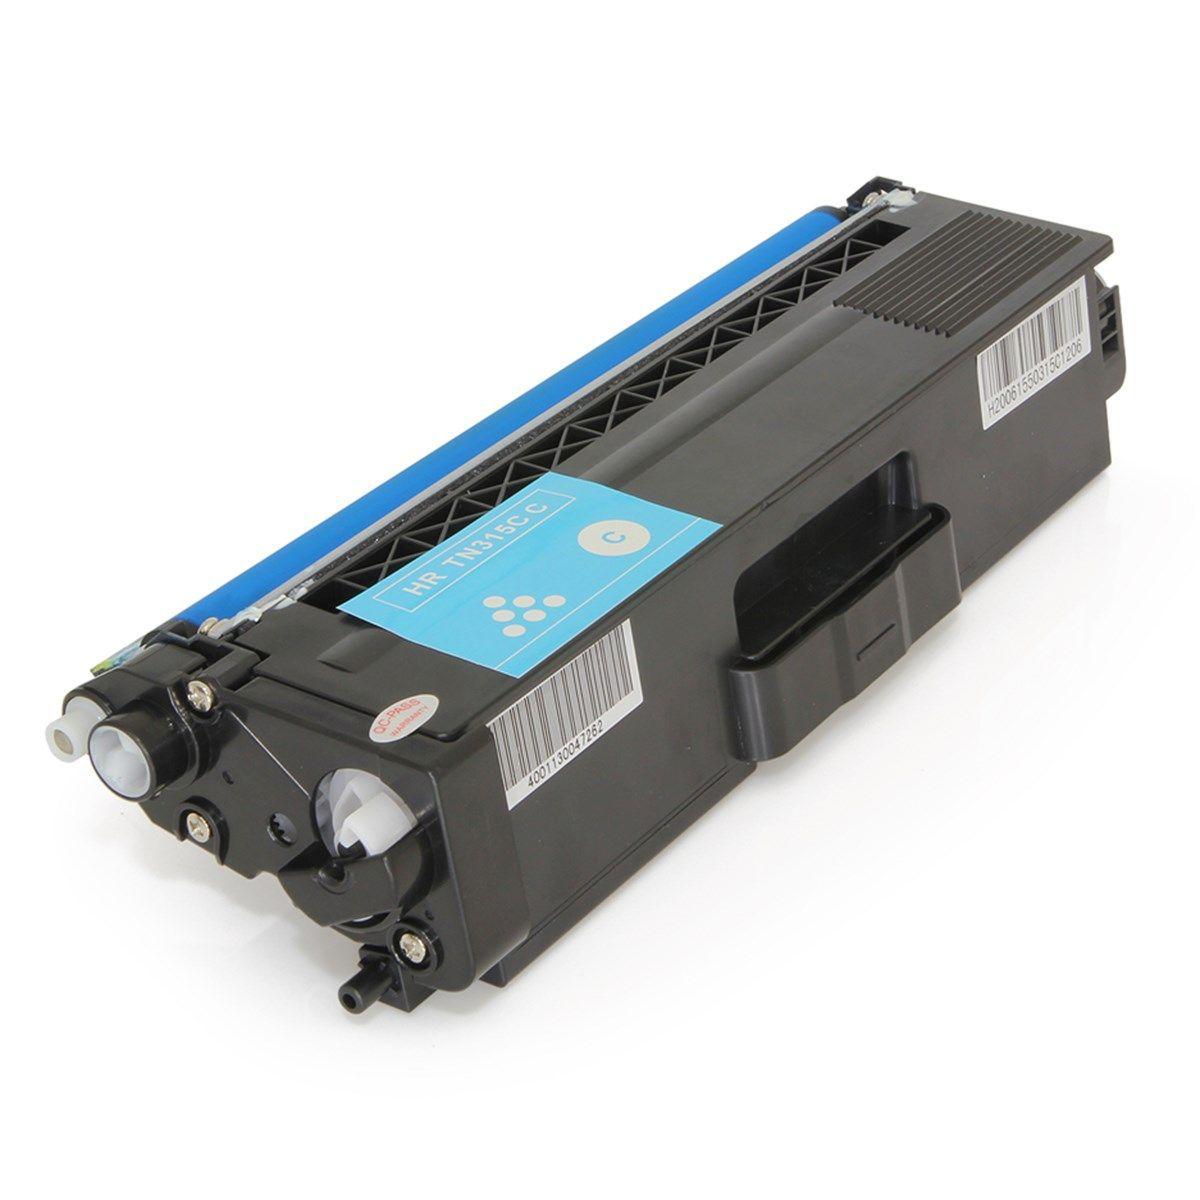 Toner Compatível com Brother TN316C TN-316 Ciano 3.500 Páginas - Cartucho & Cia